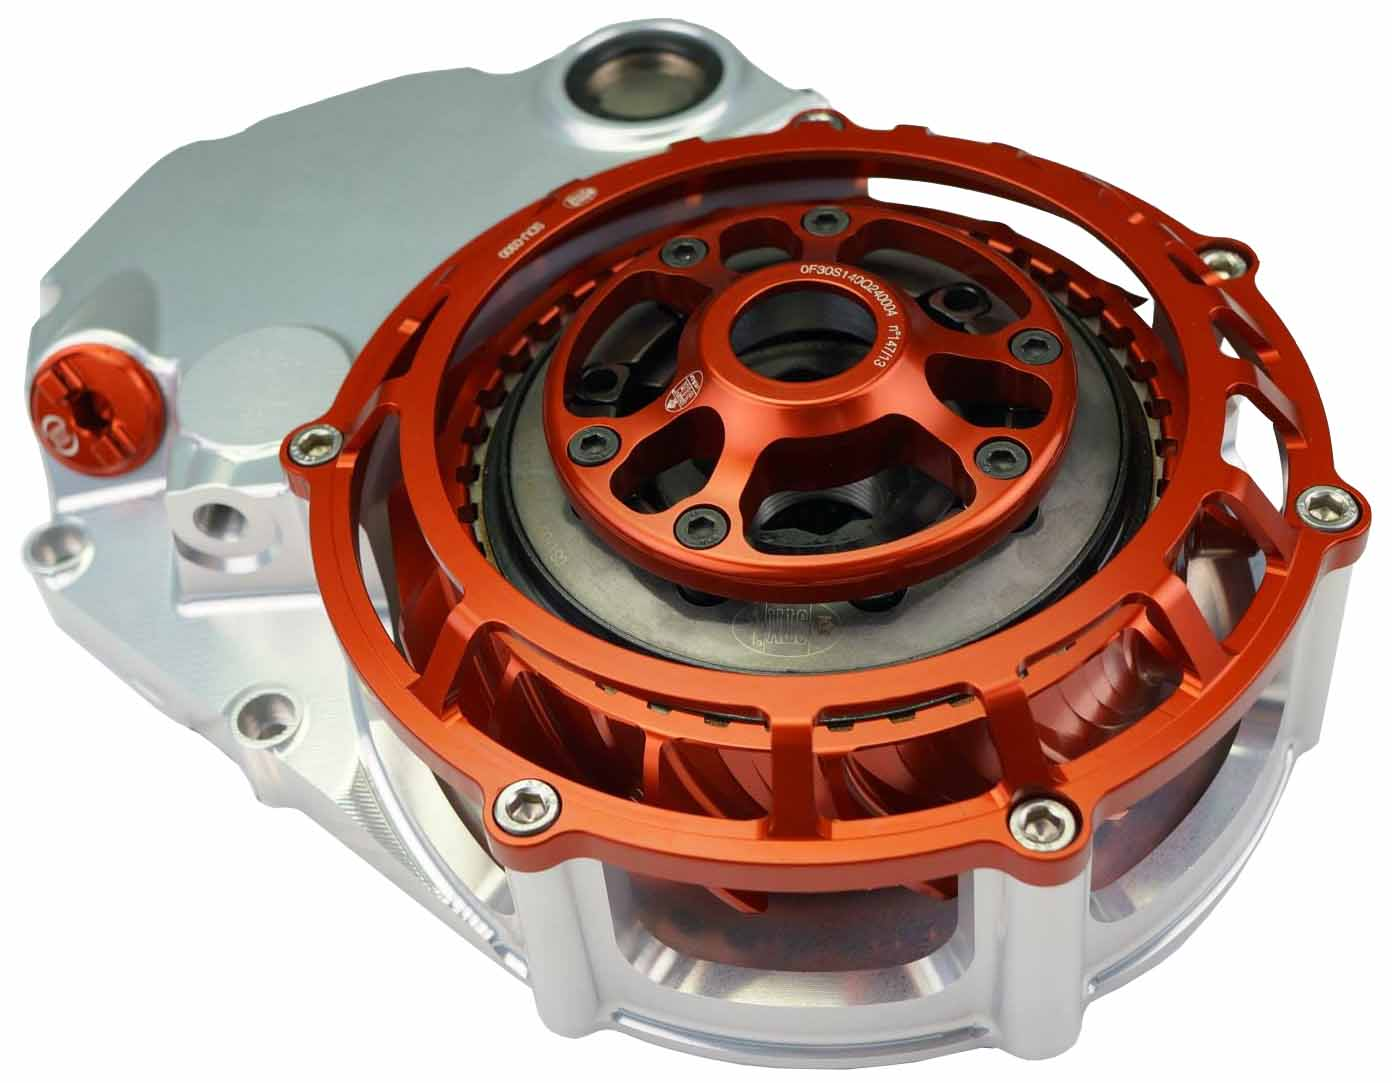 Комплект сухого сцепления STM для Ducati Monster 1200 14-15